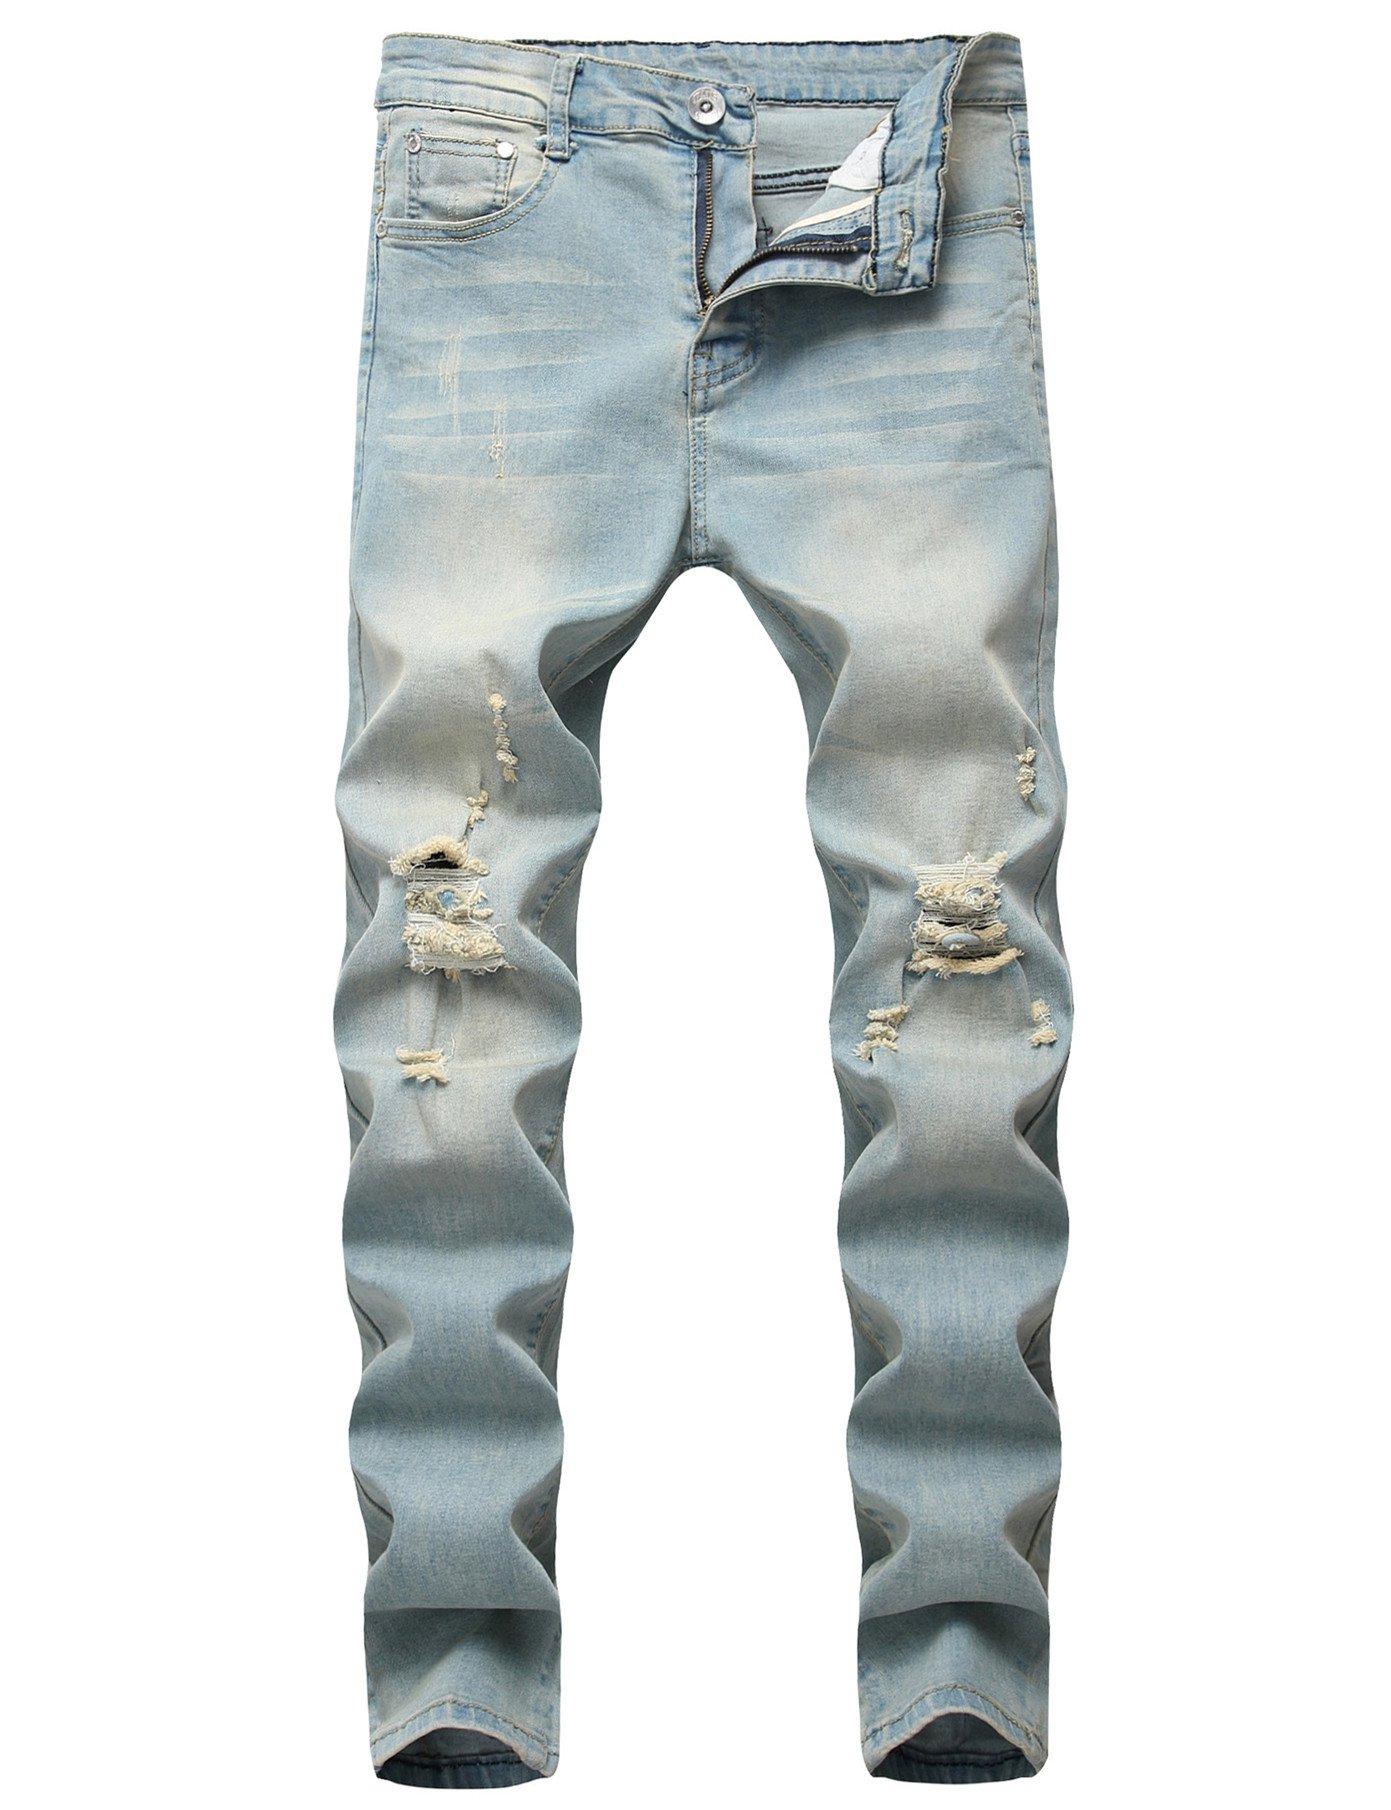 Senken Choice Men's Ripped Destroyed Distressed Knee Holes Slim Skinny Jeans Light Blue 34